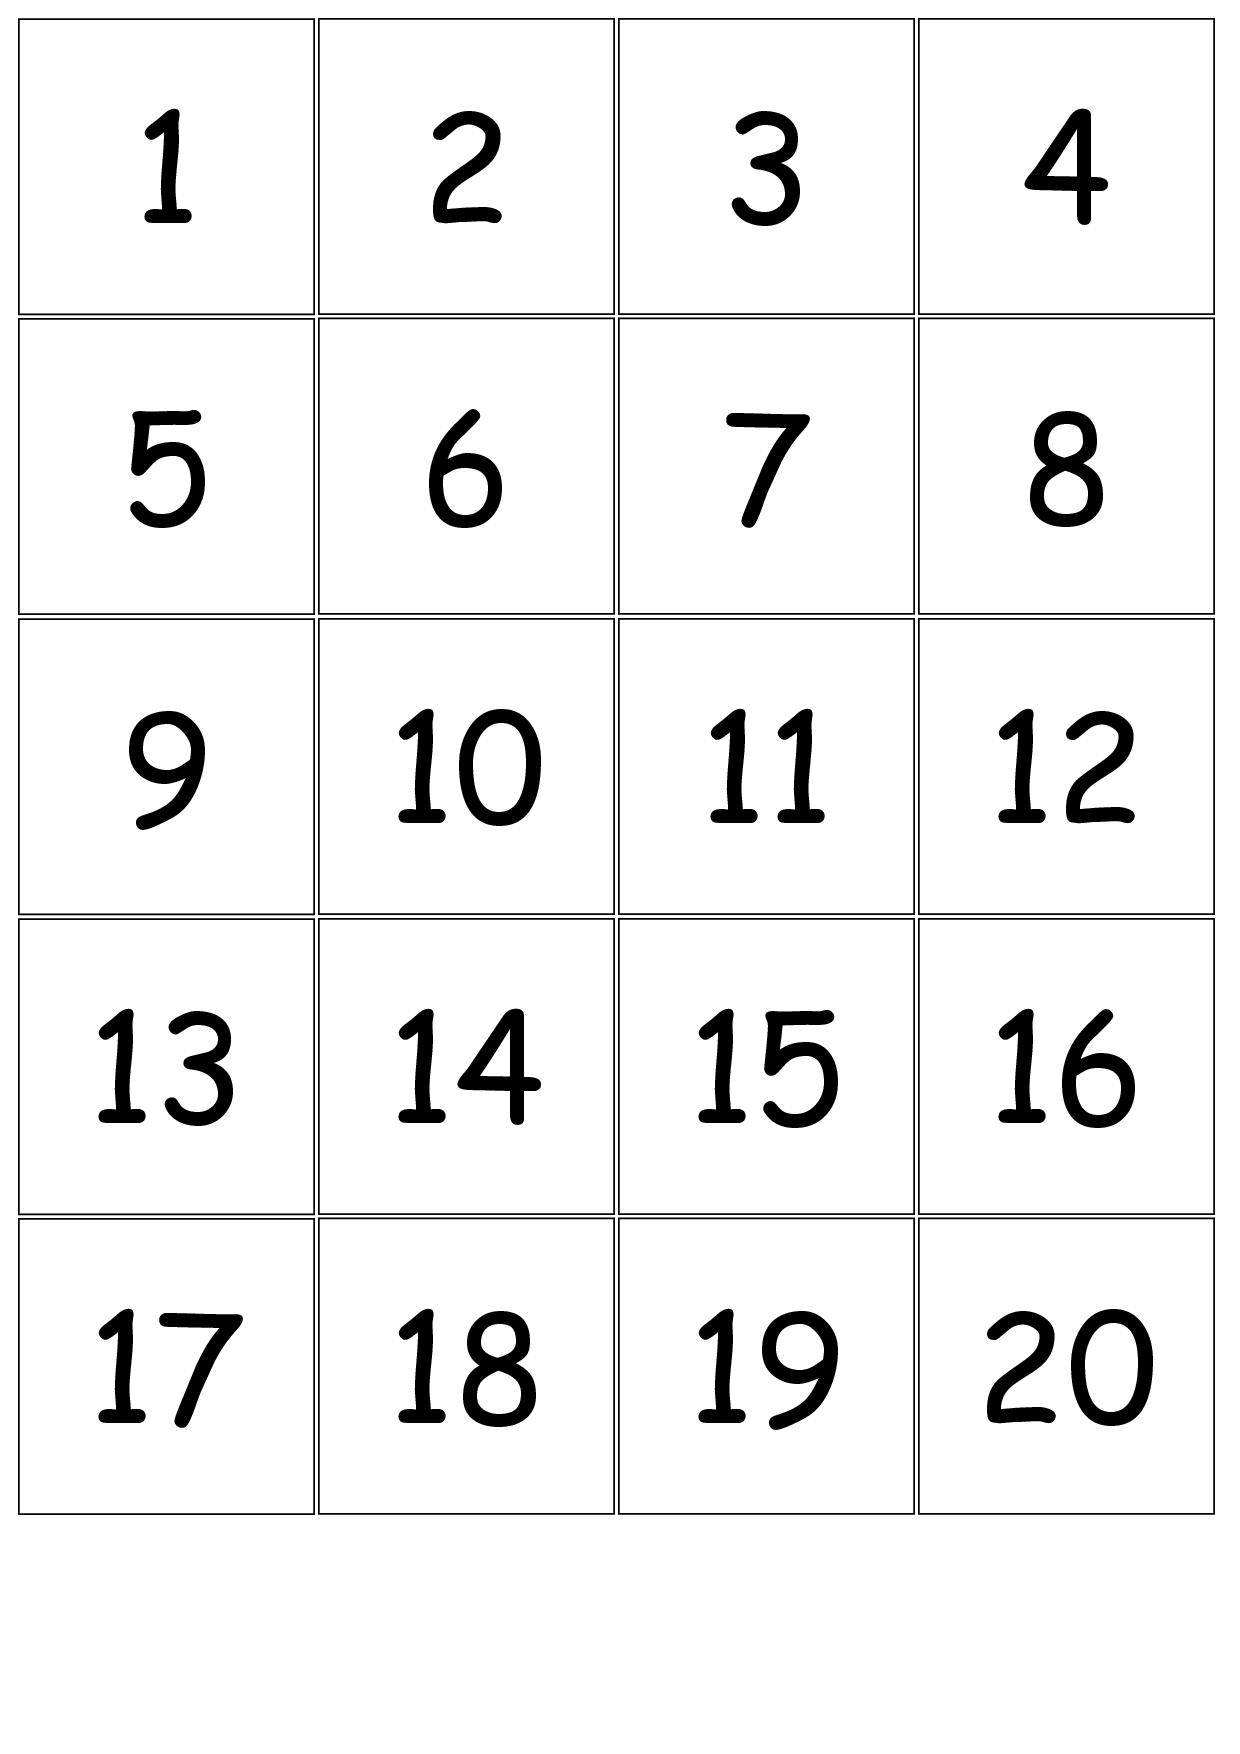 Number+Cards+1-20 | Printable Numbers, Number Cards Print Numbers 1 To 31